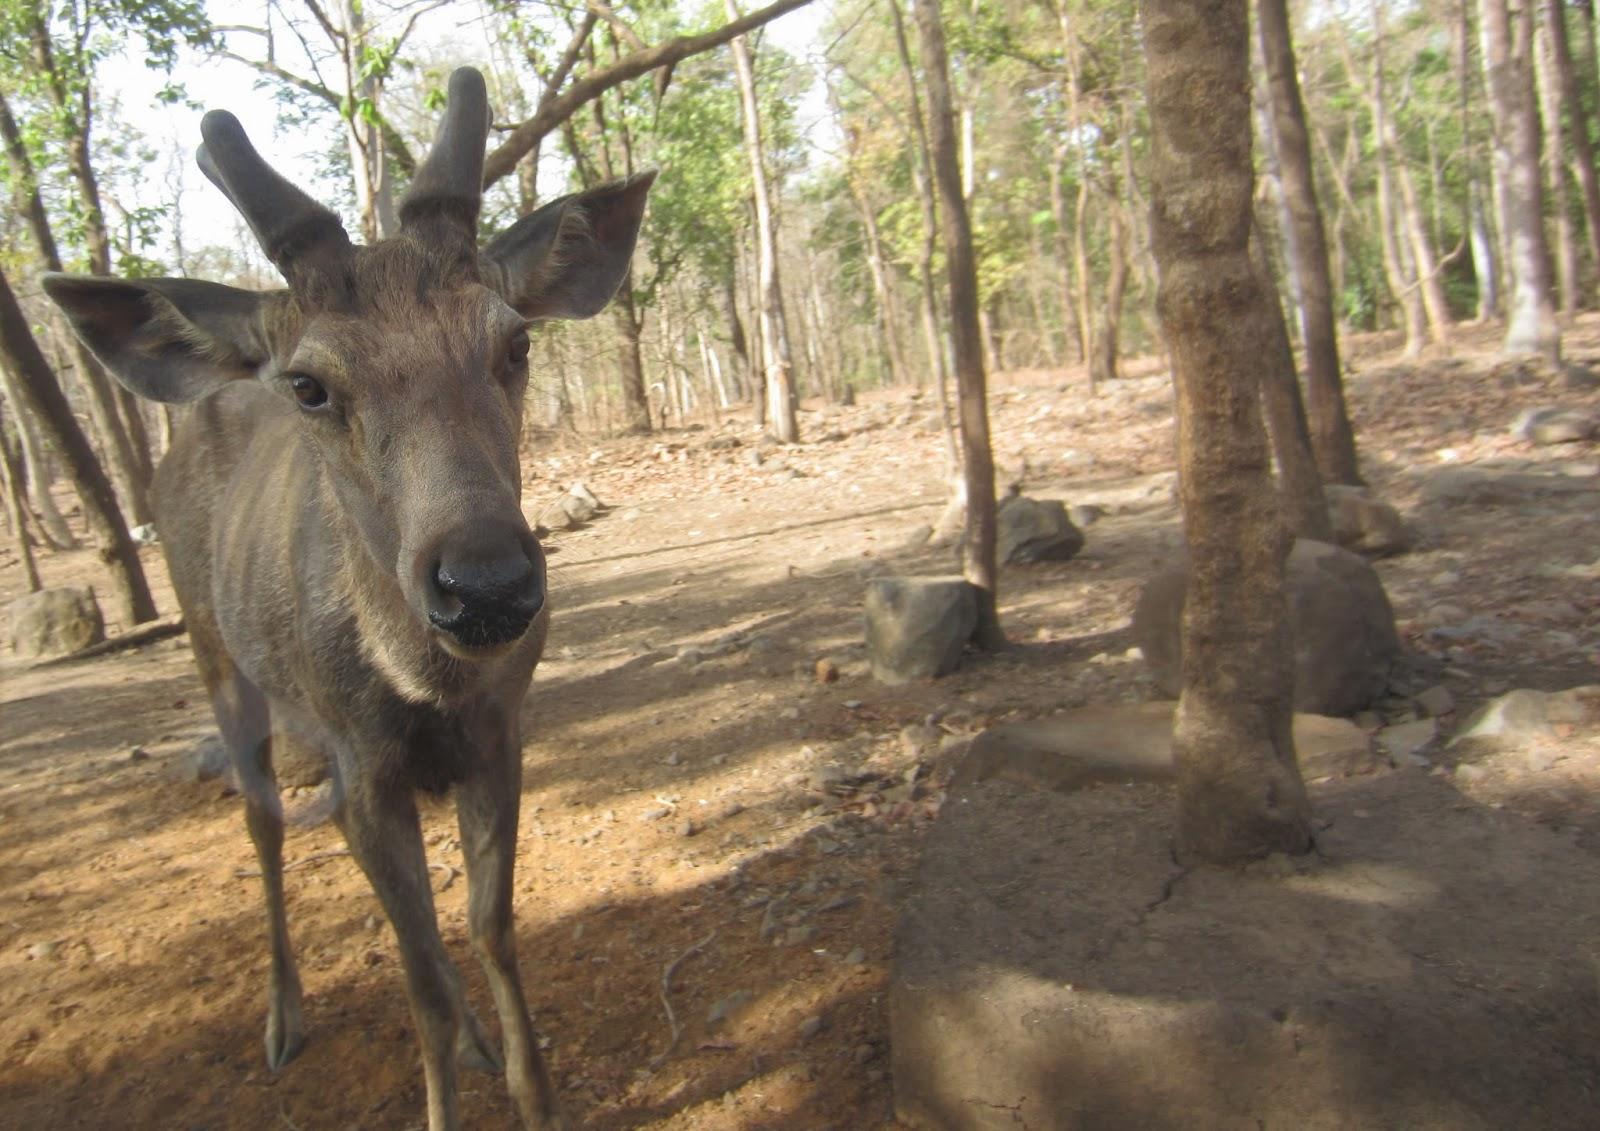 Silvassa, Dadra and Nagar Haveli, Weekend getaway Mumbai, Travel, Satmalia Deer Sanctury